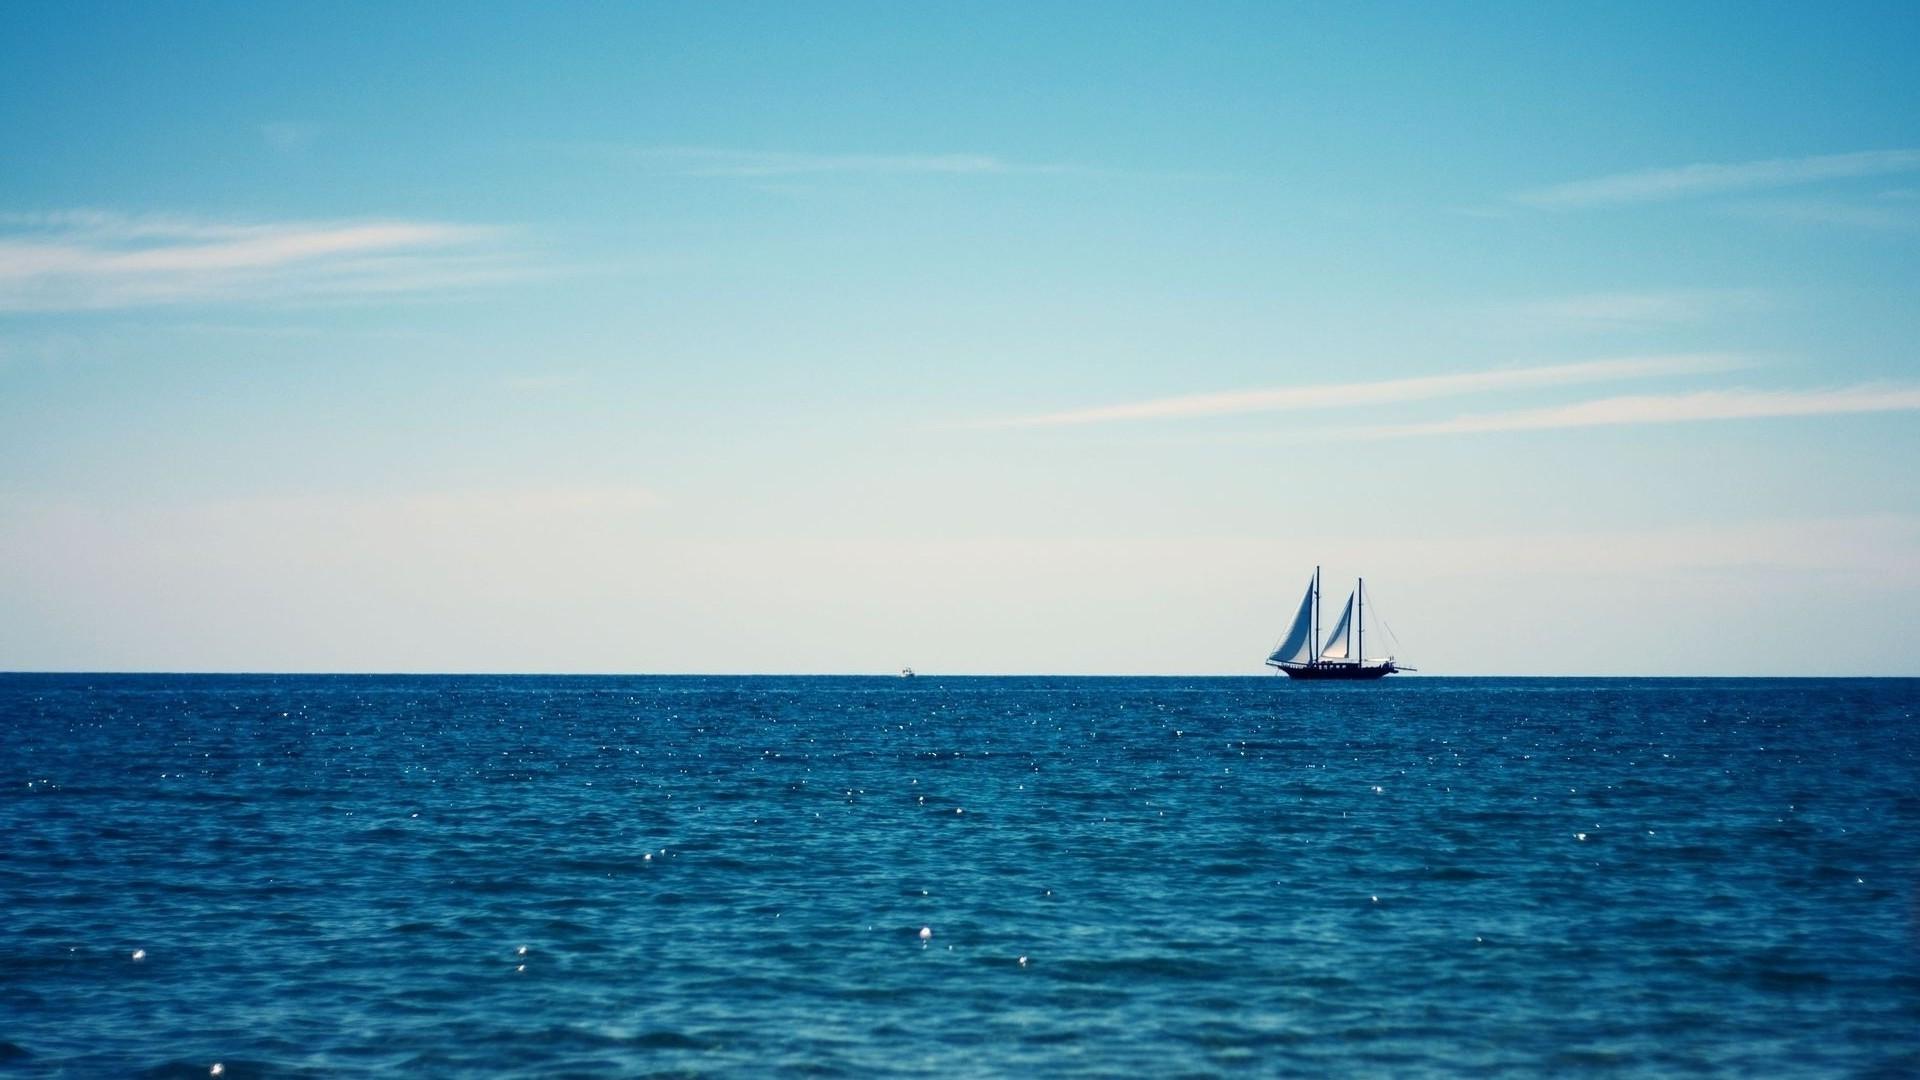 Boat Sailing Ship Sea Bay Water Minimalism Sky Vehicle Clouds Beach Horizon Dusk Ocean Sailboat